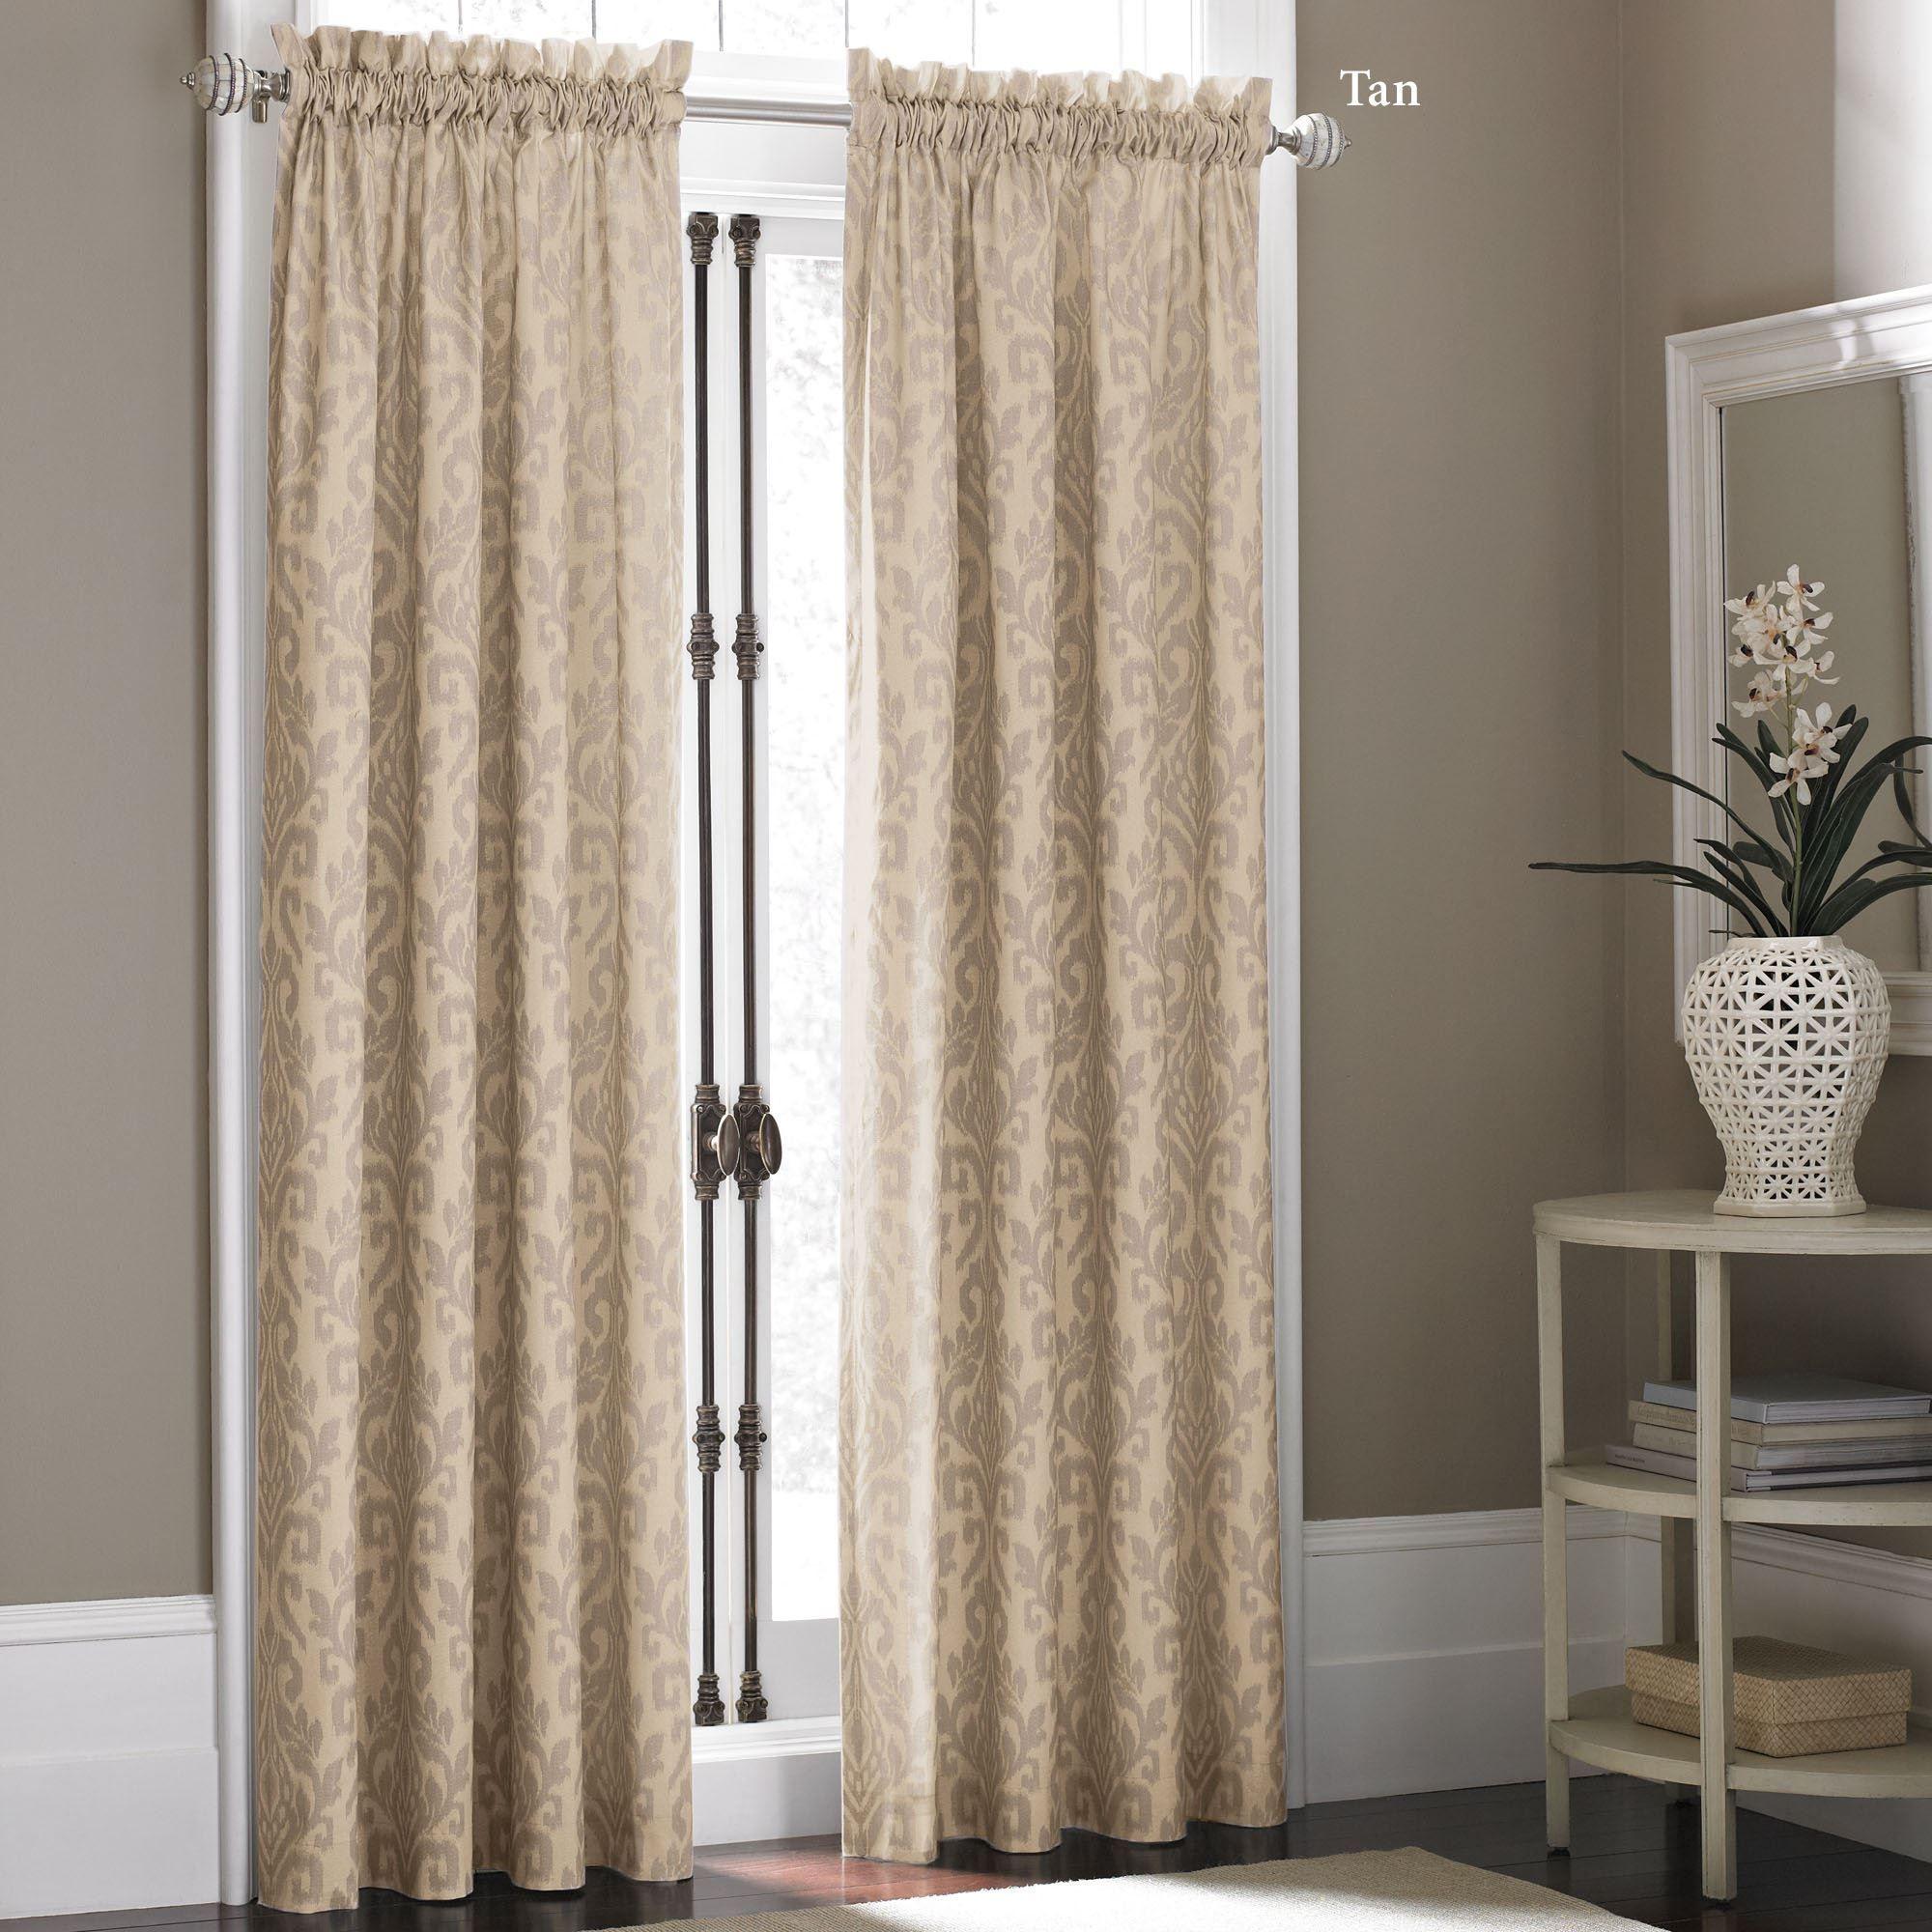 decorative with curtain ball walmart inch com diameter rod mainstays ip curtains finial